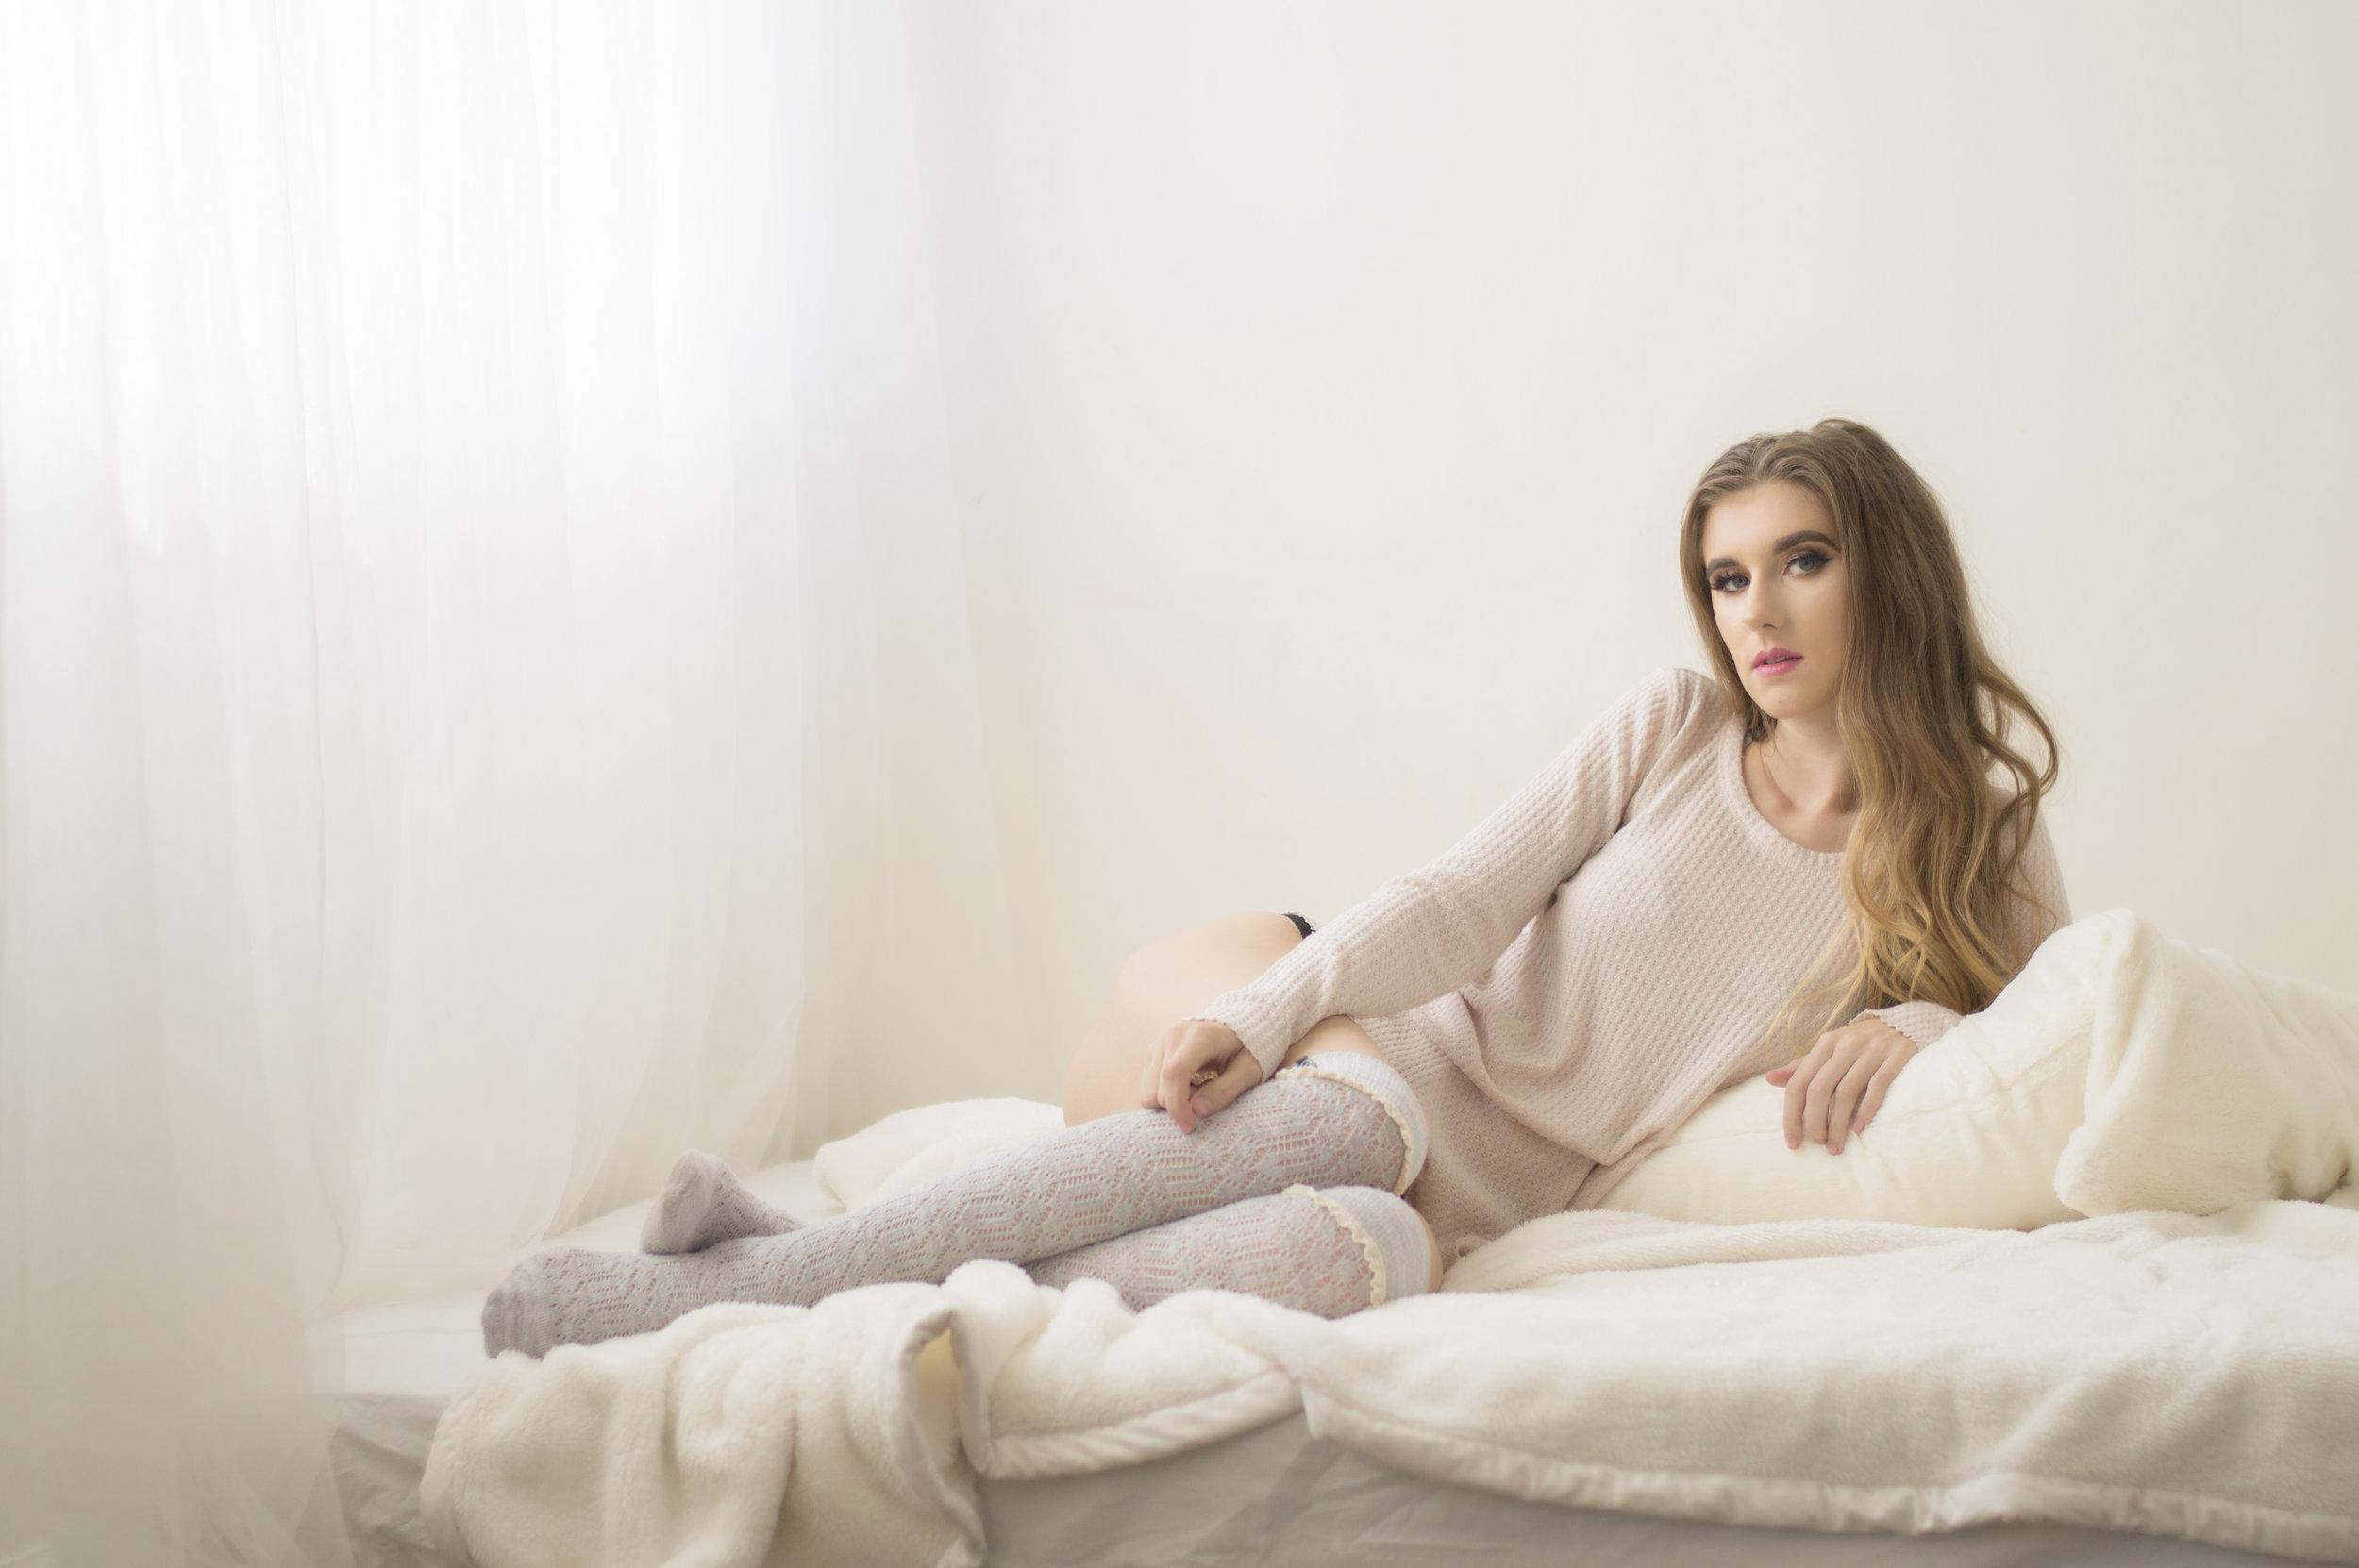 sexy-intimate-boudoir-photography-phoenix-scottsdale-mesa-gilbert-chandler-az-004